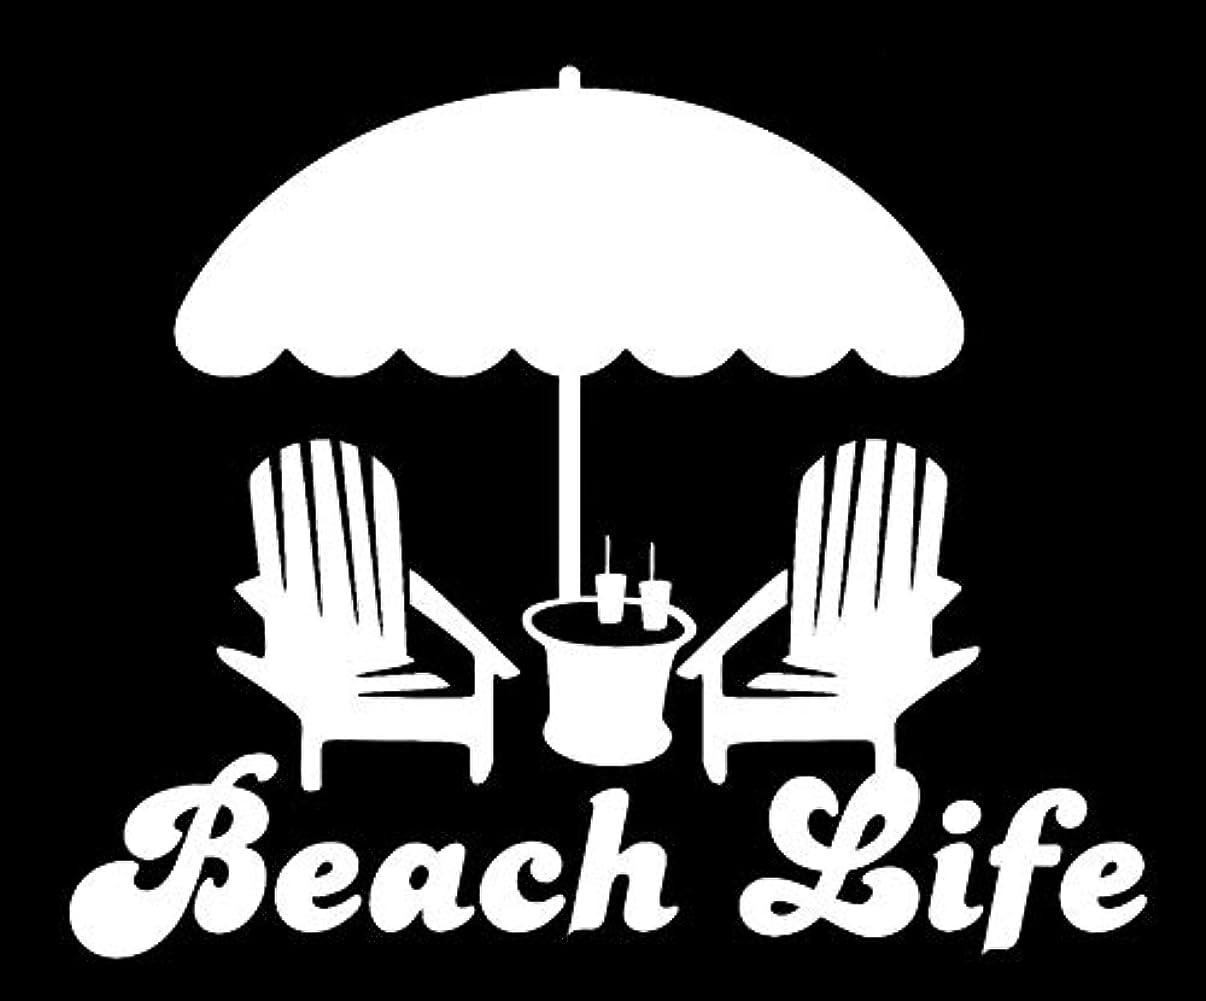 LLI Beach Life | Decal Vinyl Sticker | Cars Trucks Vans Walls Laptop | White | 5.5 x 4.6 in | LLI1234